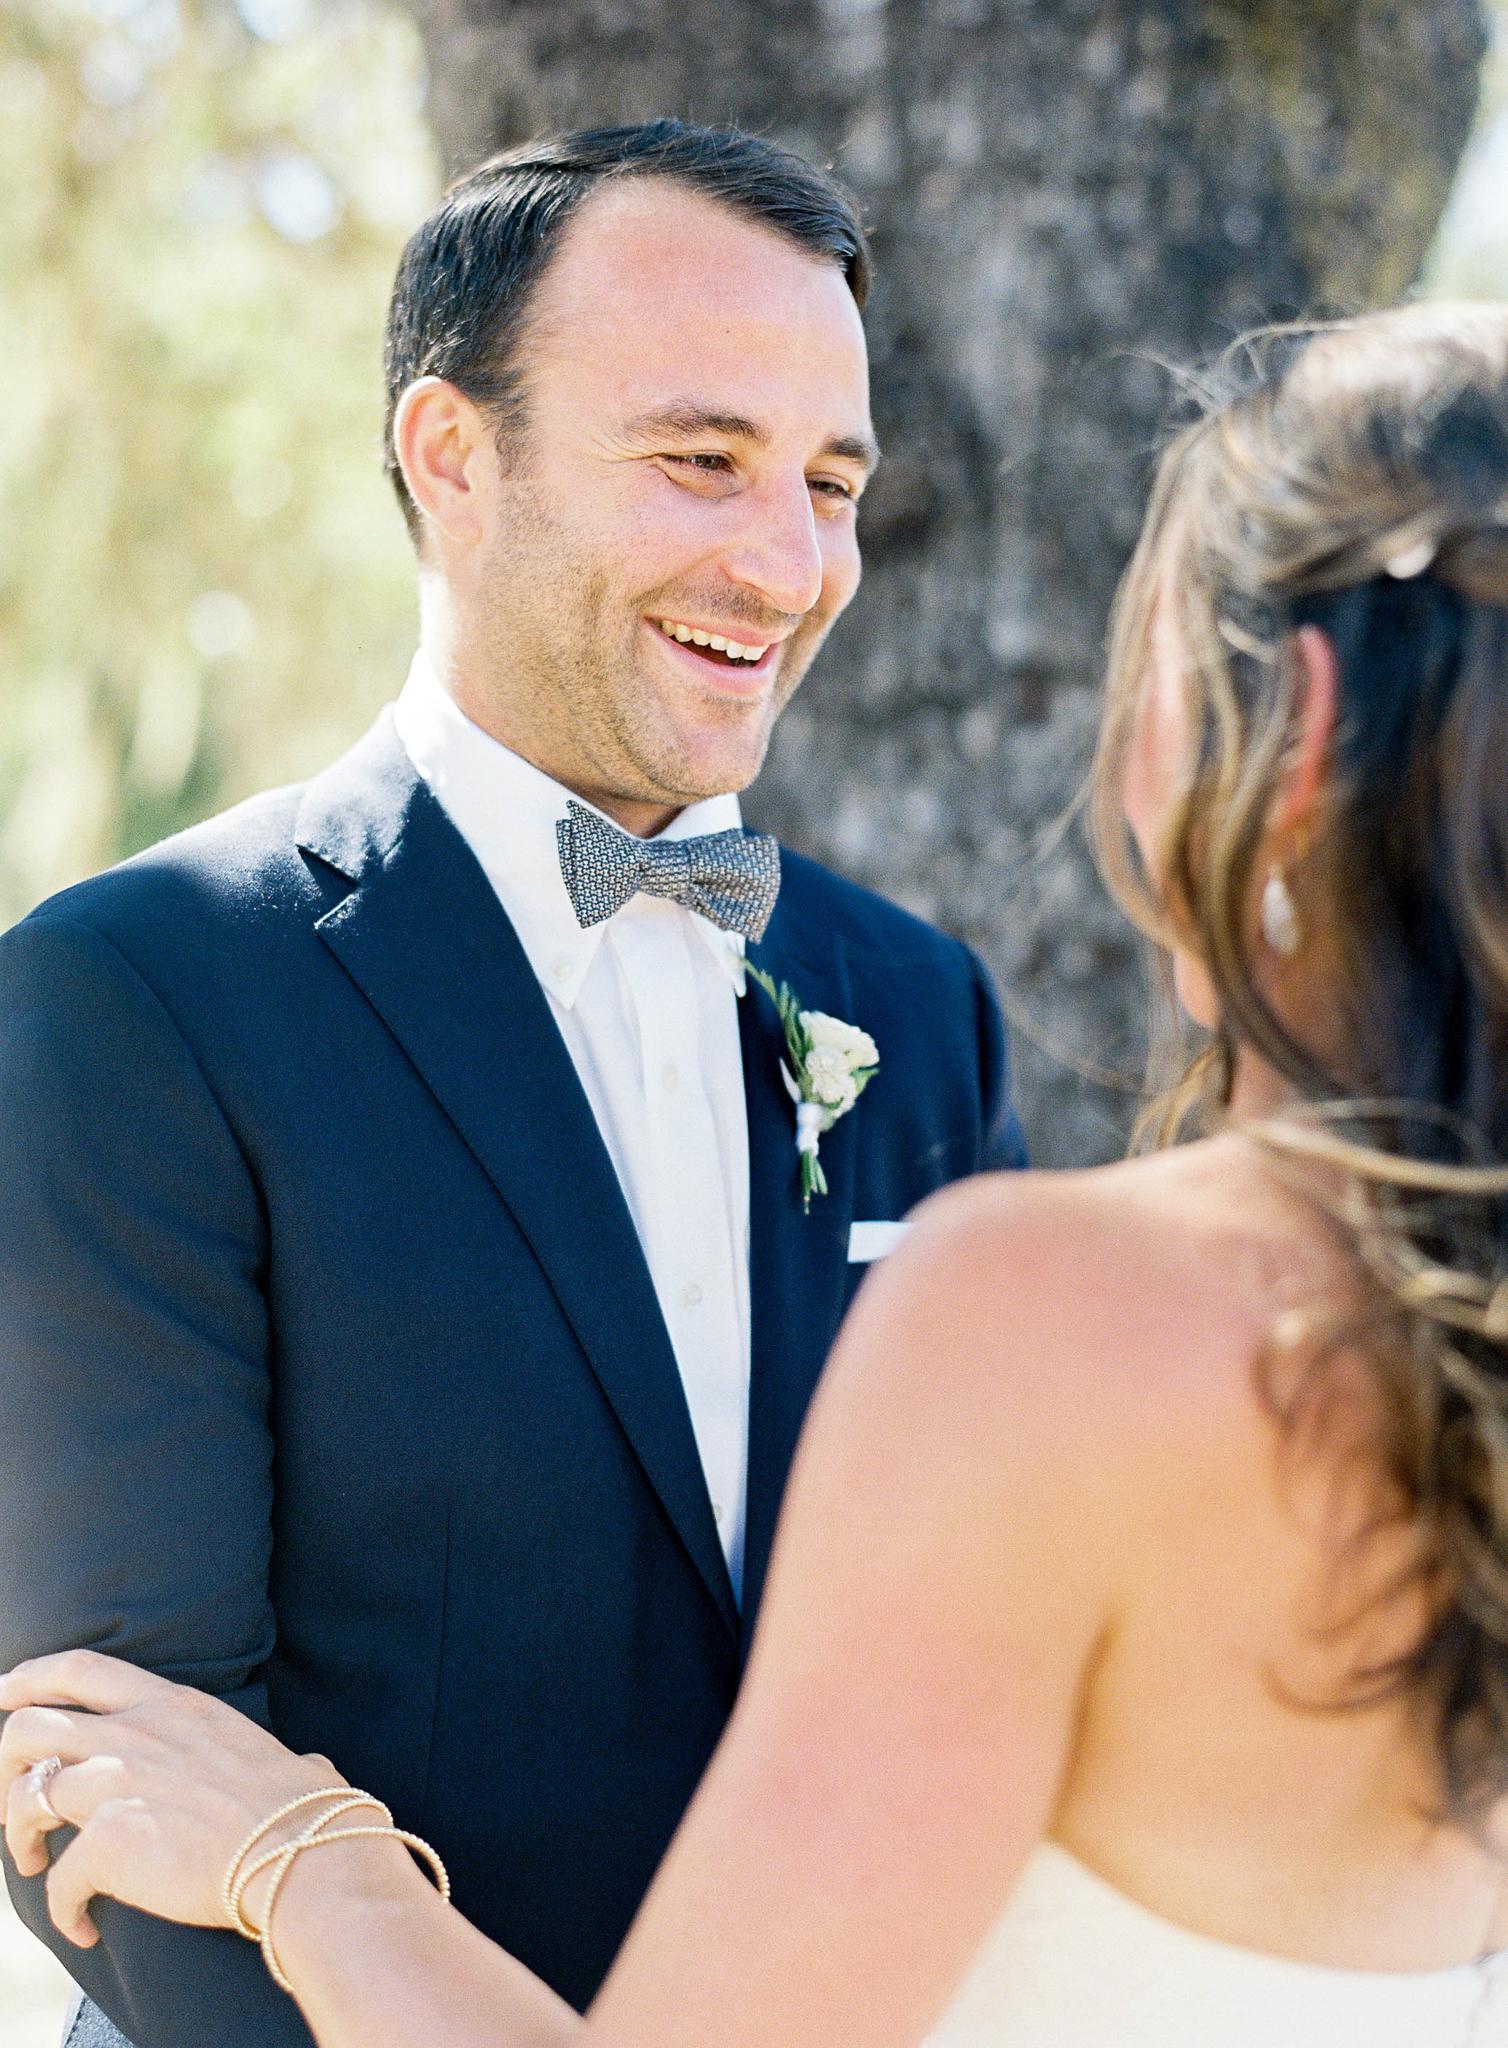 Meghan Mehan Photography - Fine Art Film Wedding Photography - San Francisco   Napa   Sonoma   Big Sur   Chicago   Minneapolis   Milwaukee   Lake Geneva   Door County   Wisconsin 011.jpg